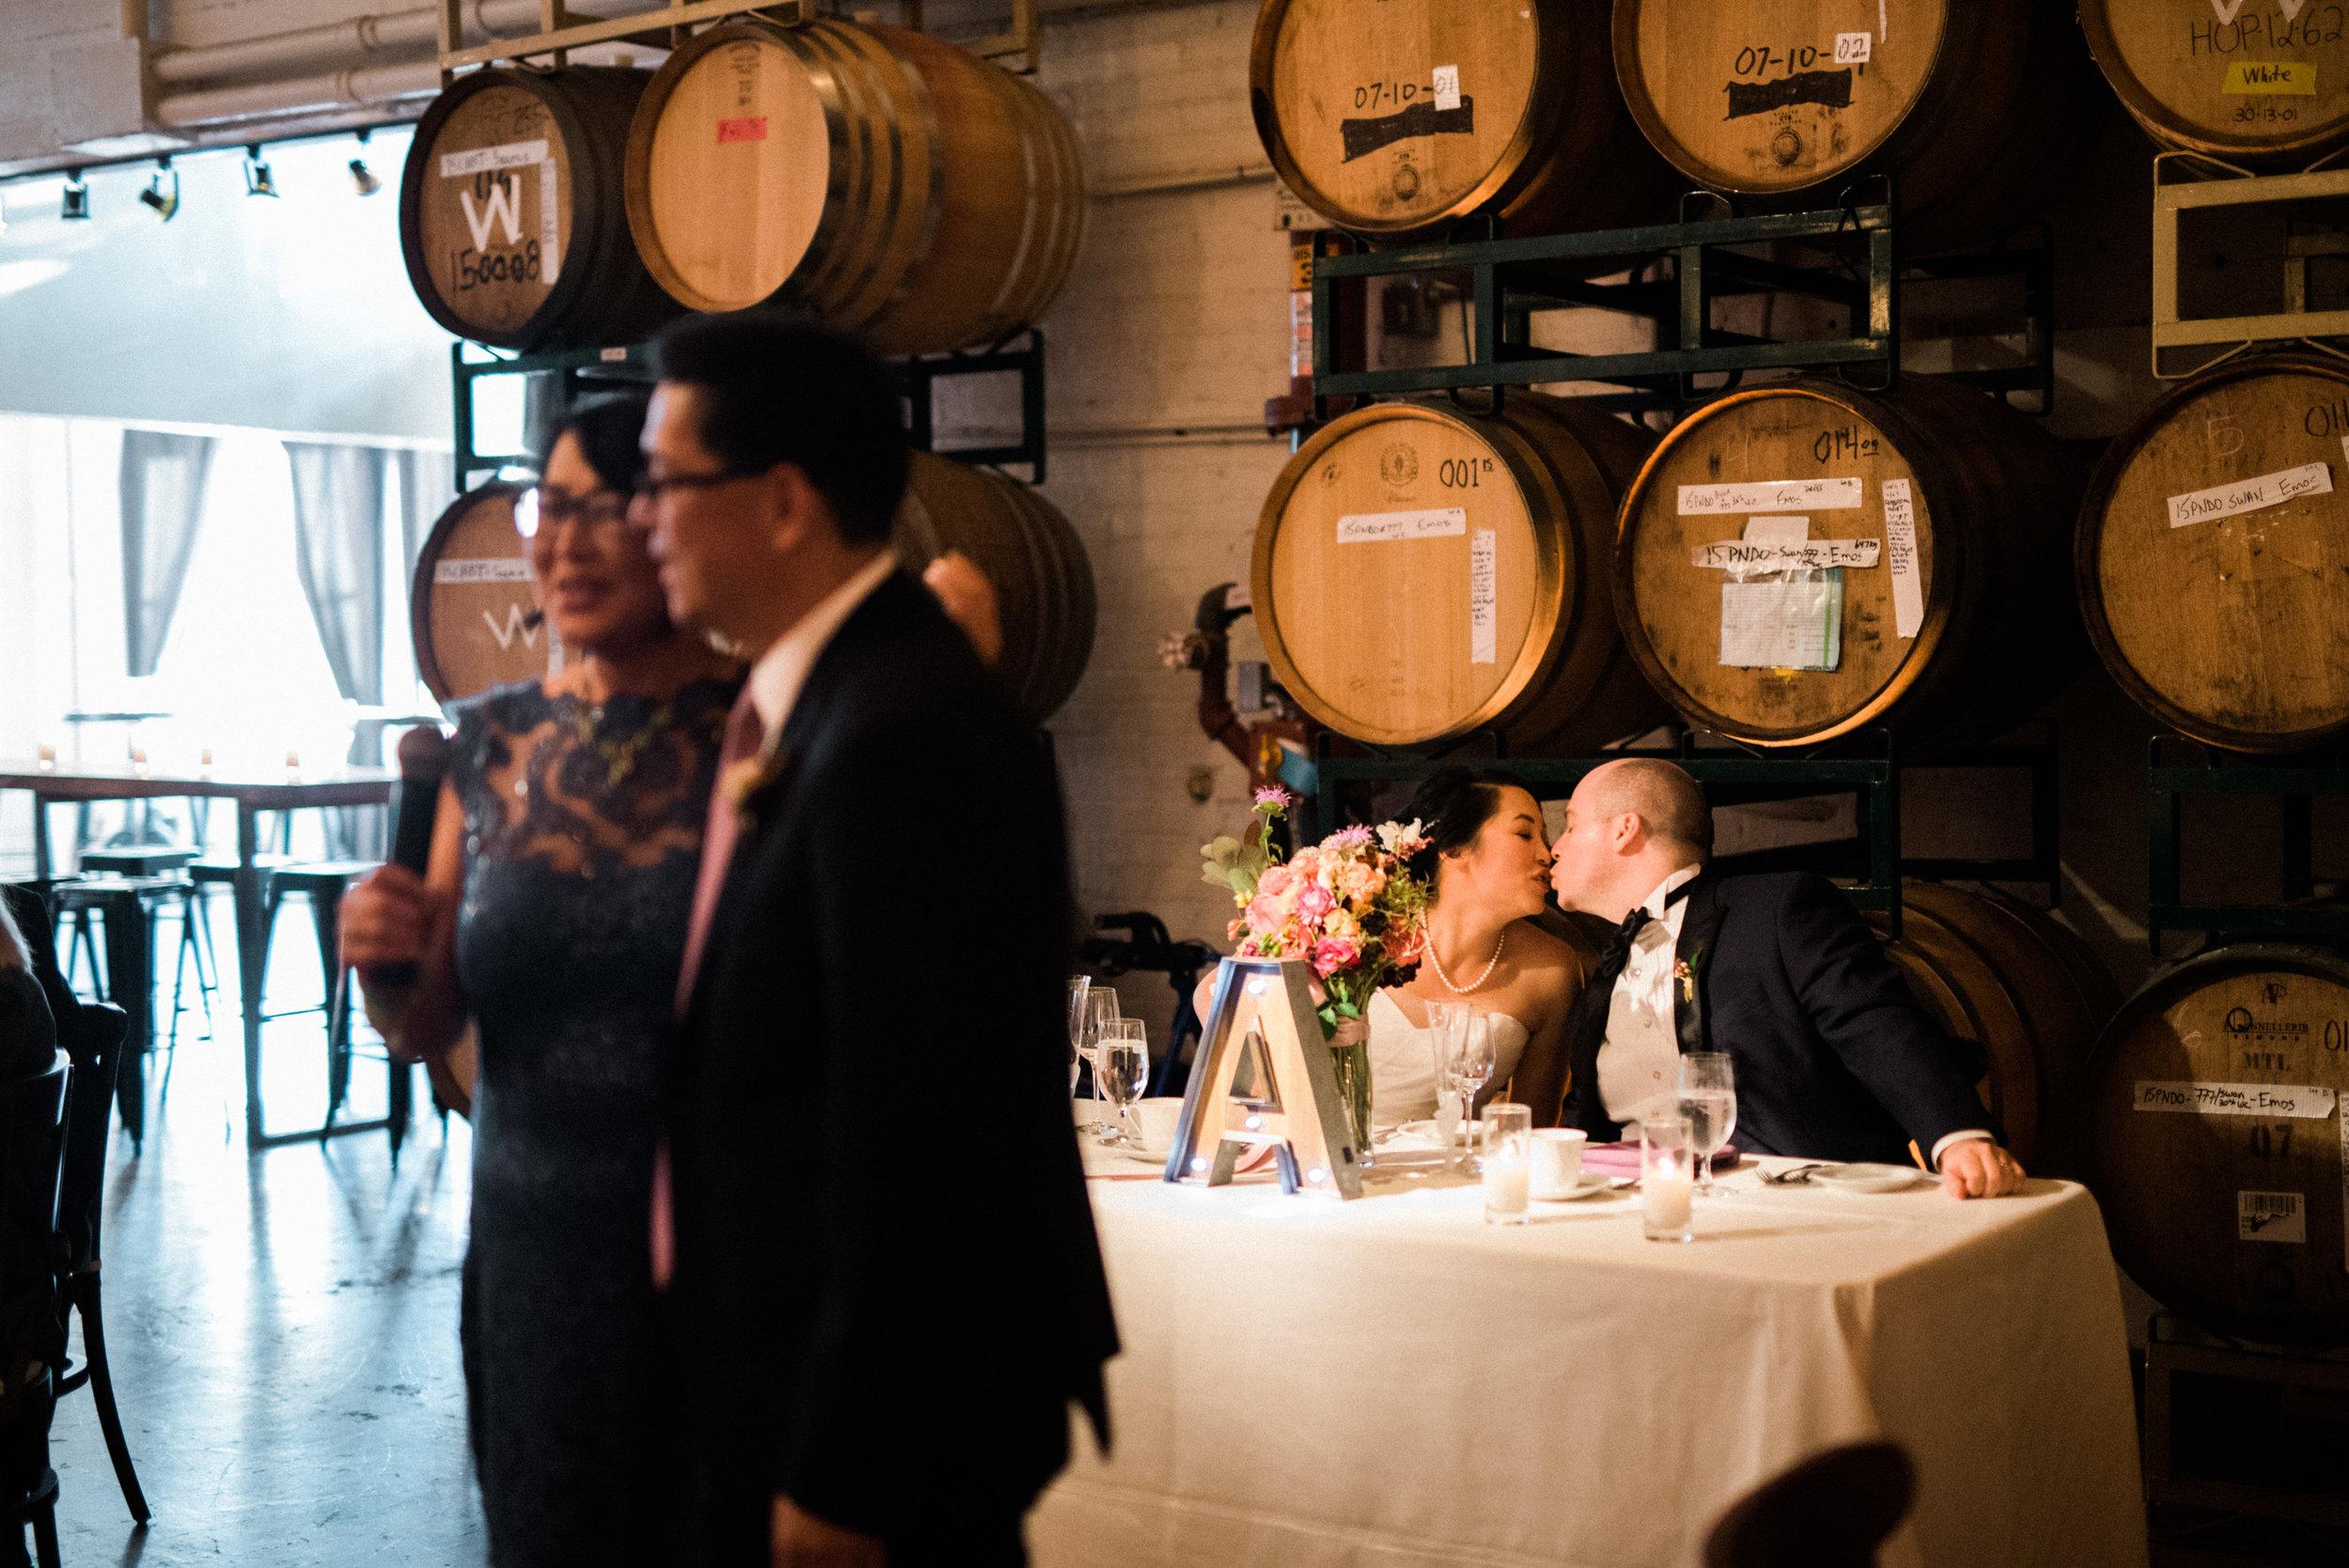 Swedenborgian Church Dogpatch Winery Wedding067.jpg